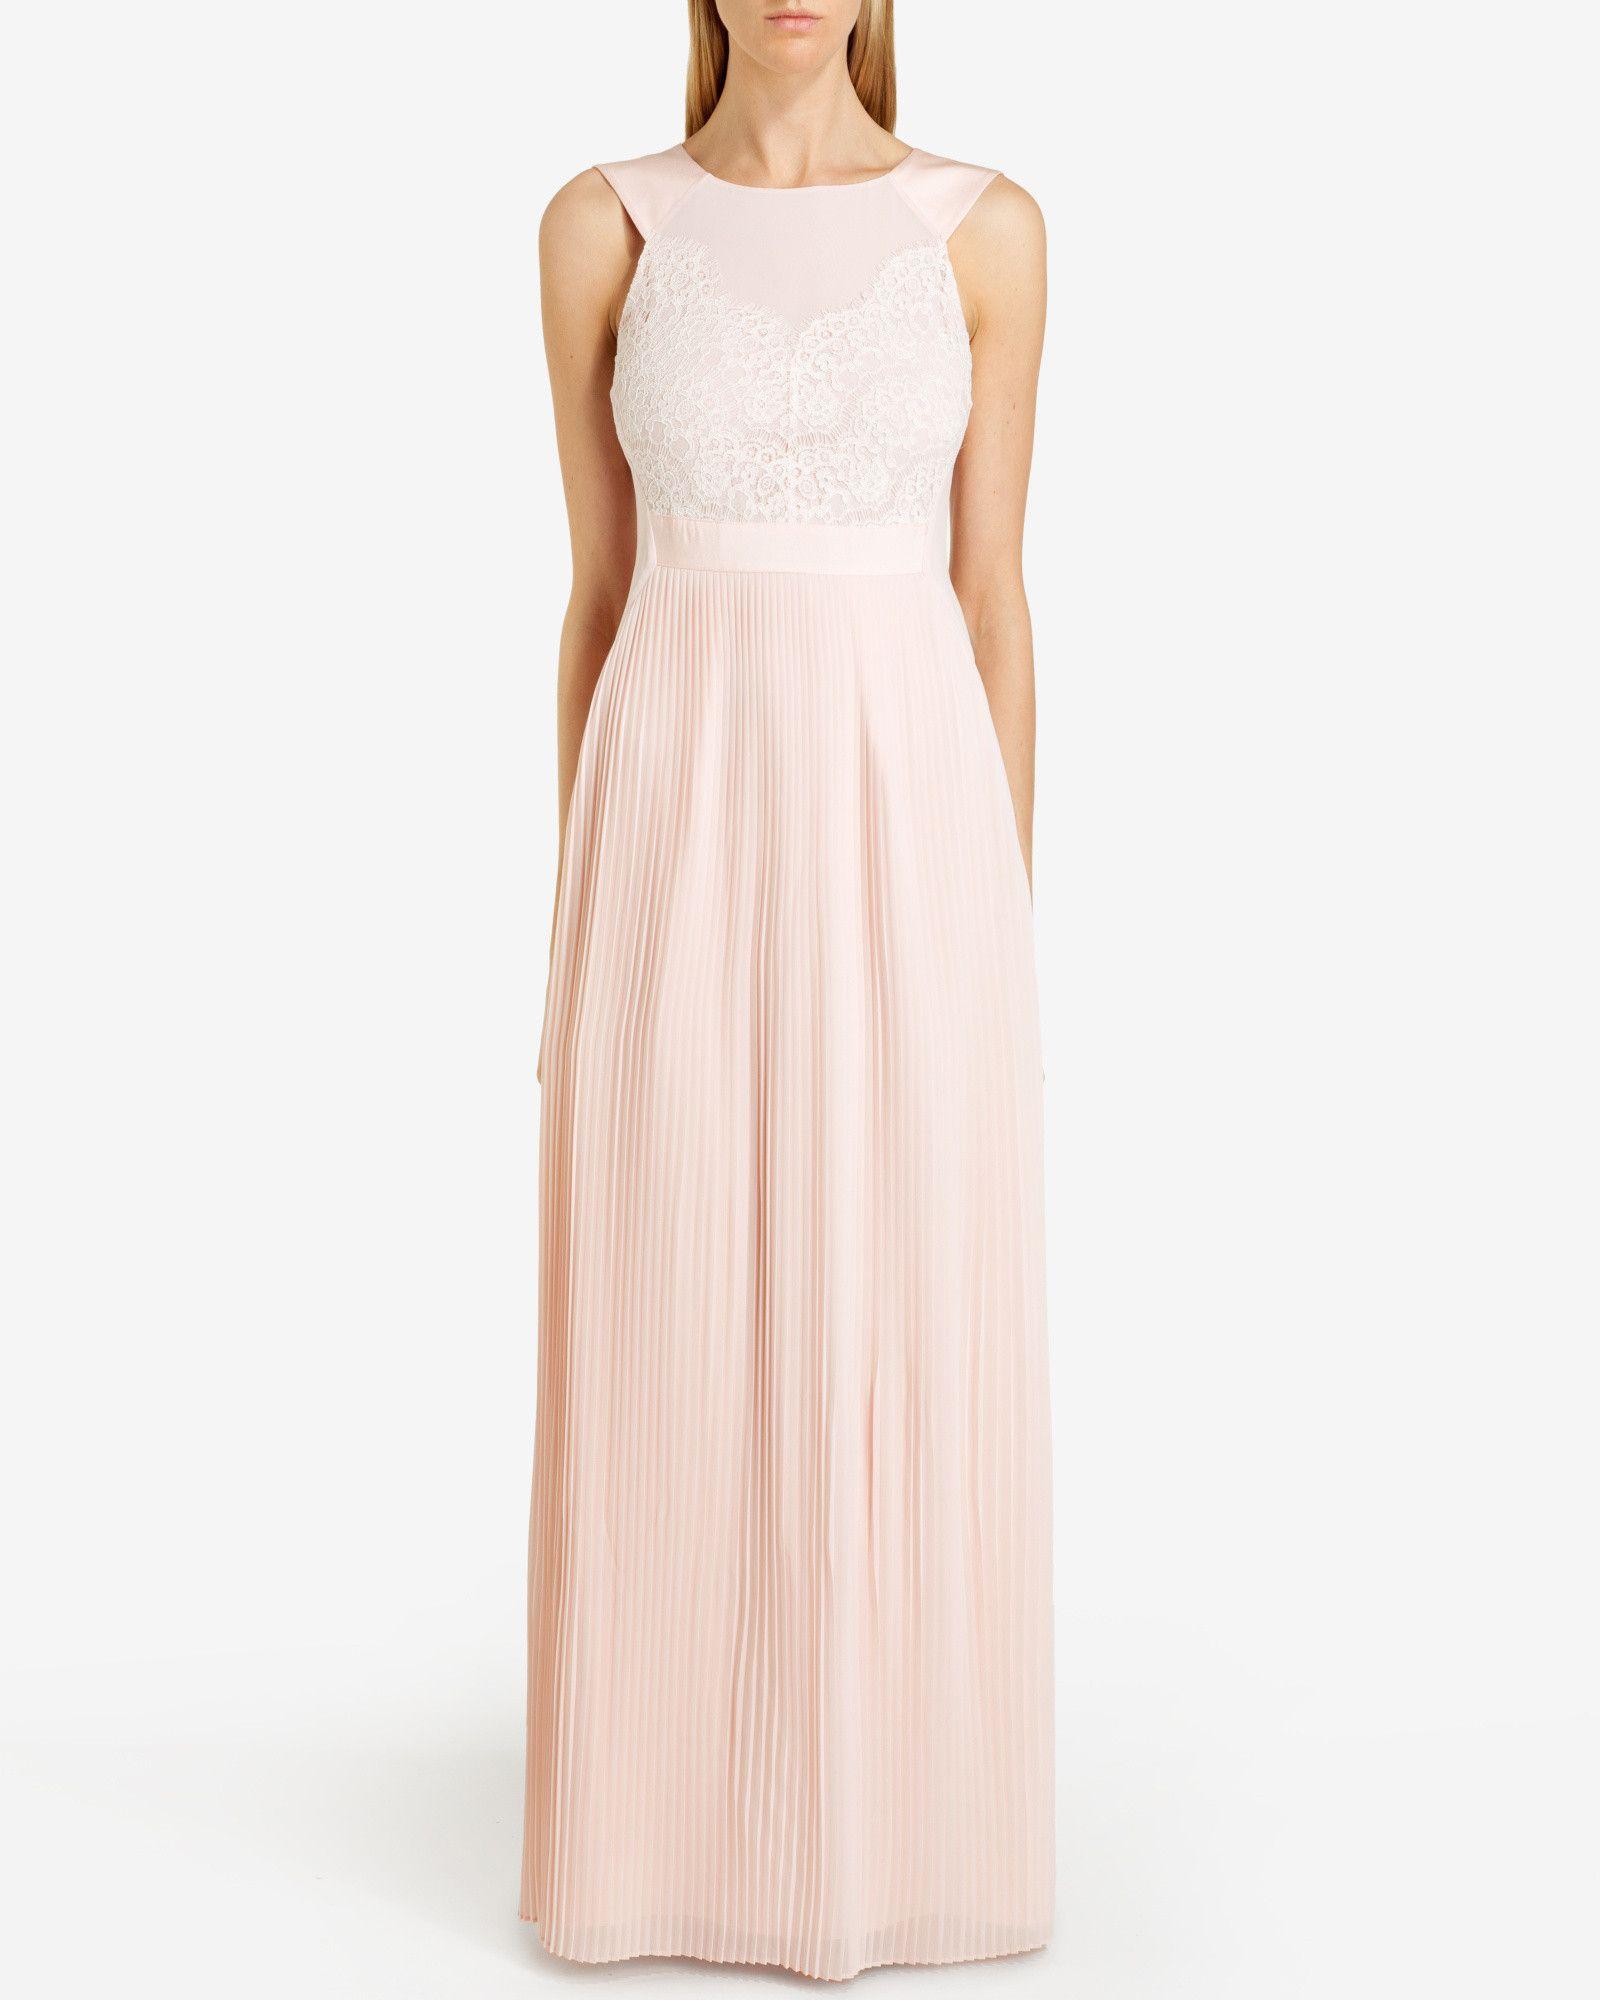 Bridesmaid Dress #bridesmaid #pastel #neutrals #pink #dress #wedding ...